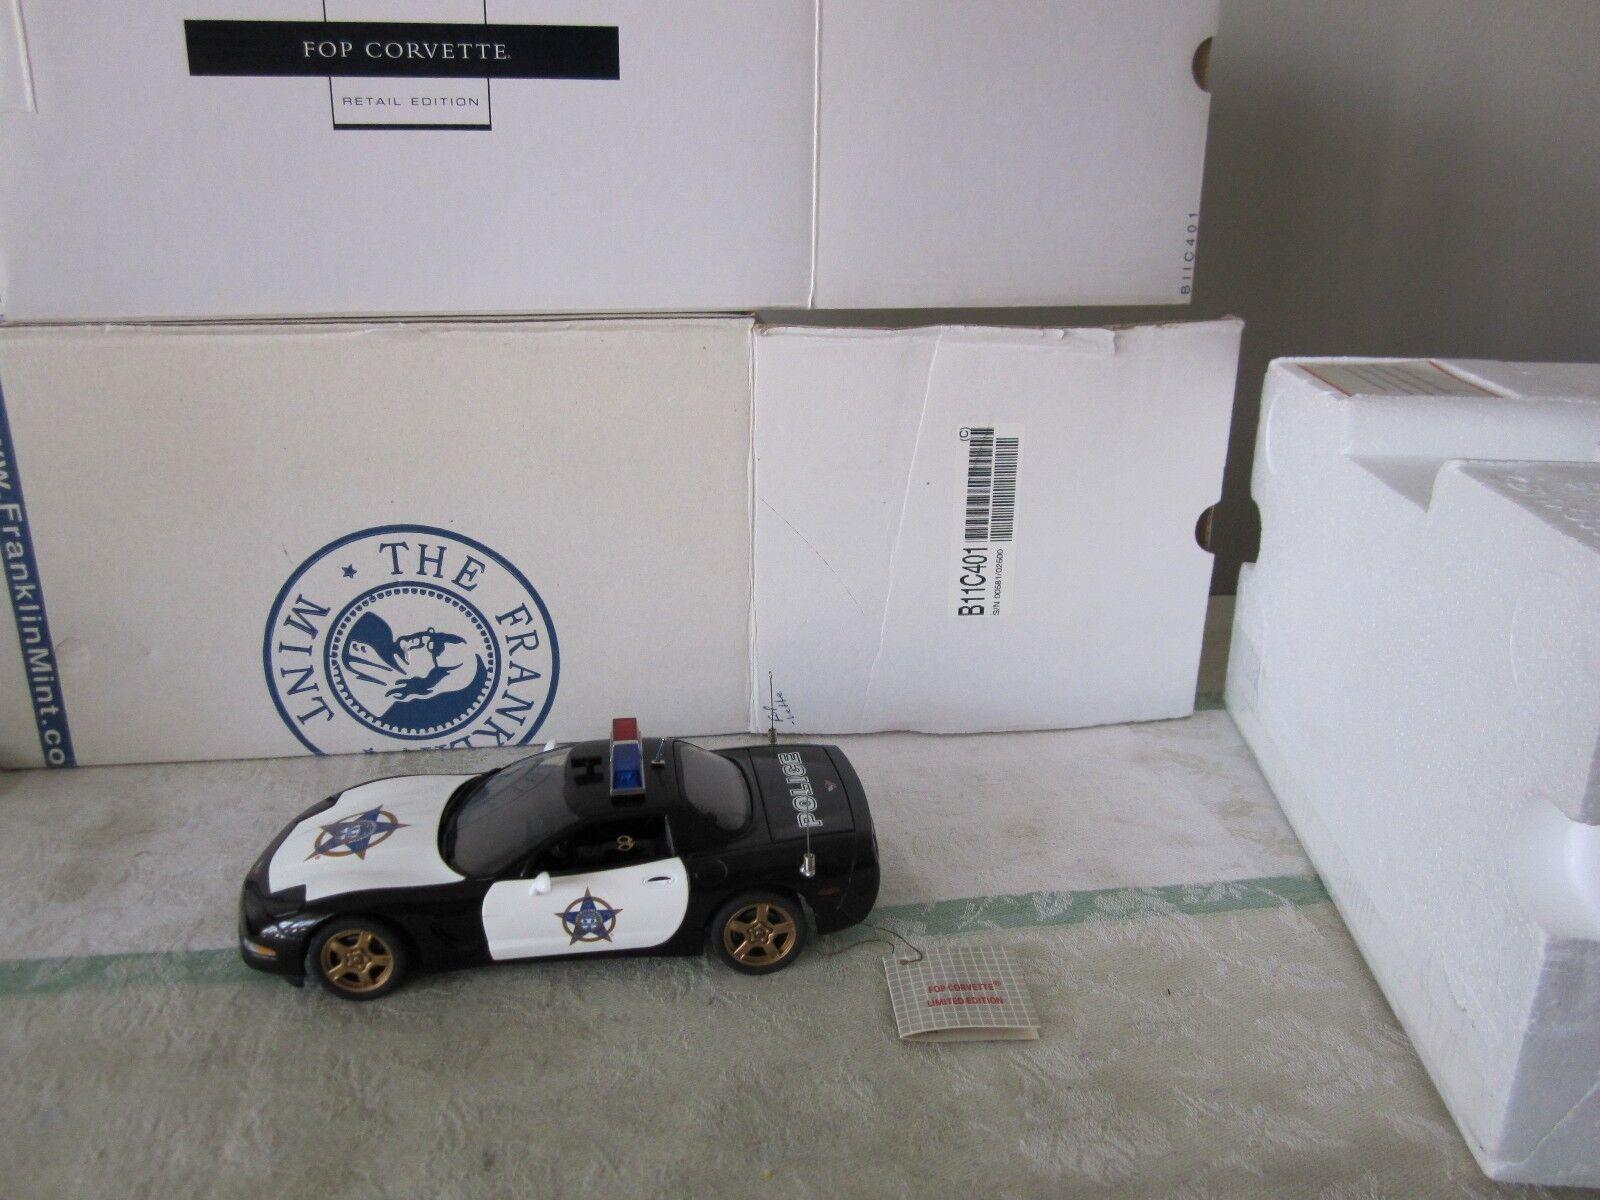 Franklin mint Corvette 1999 FOP policía 1 24 B11C401 de 2500